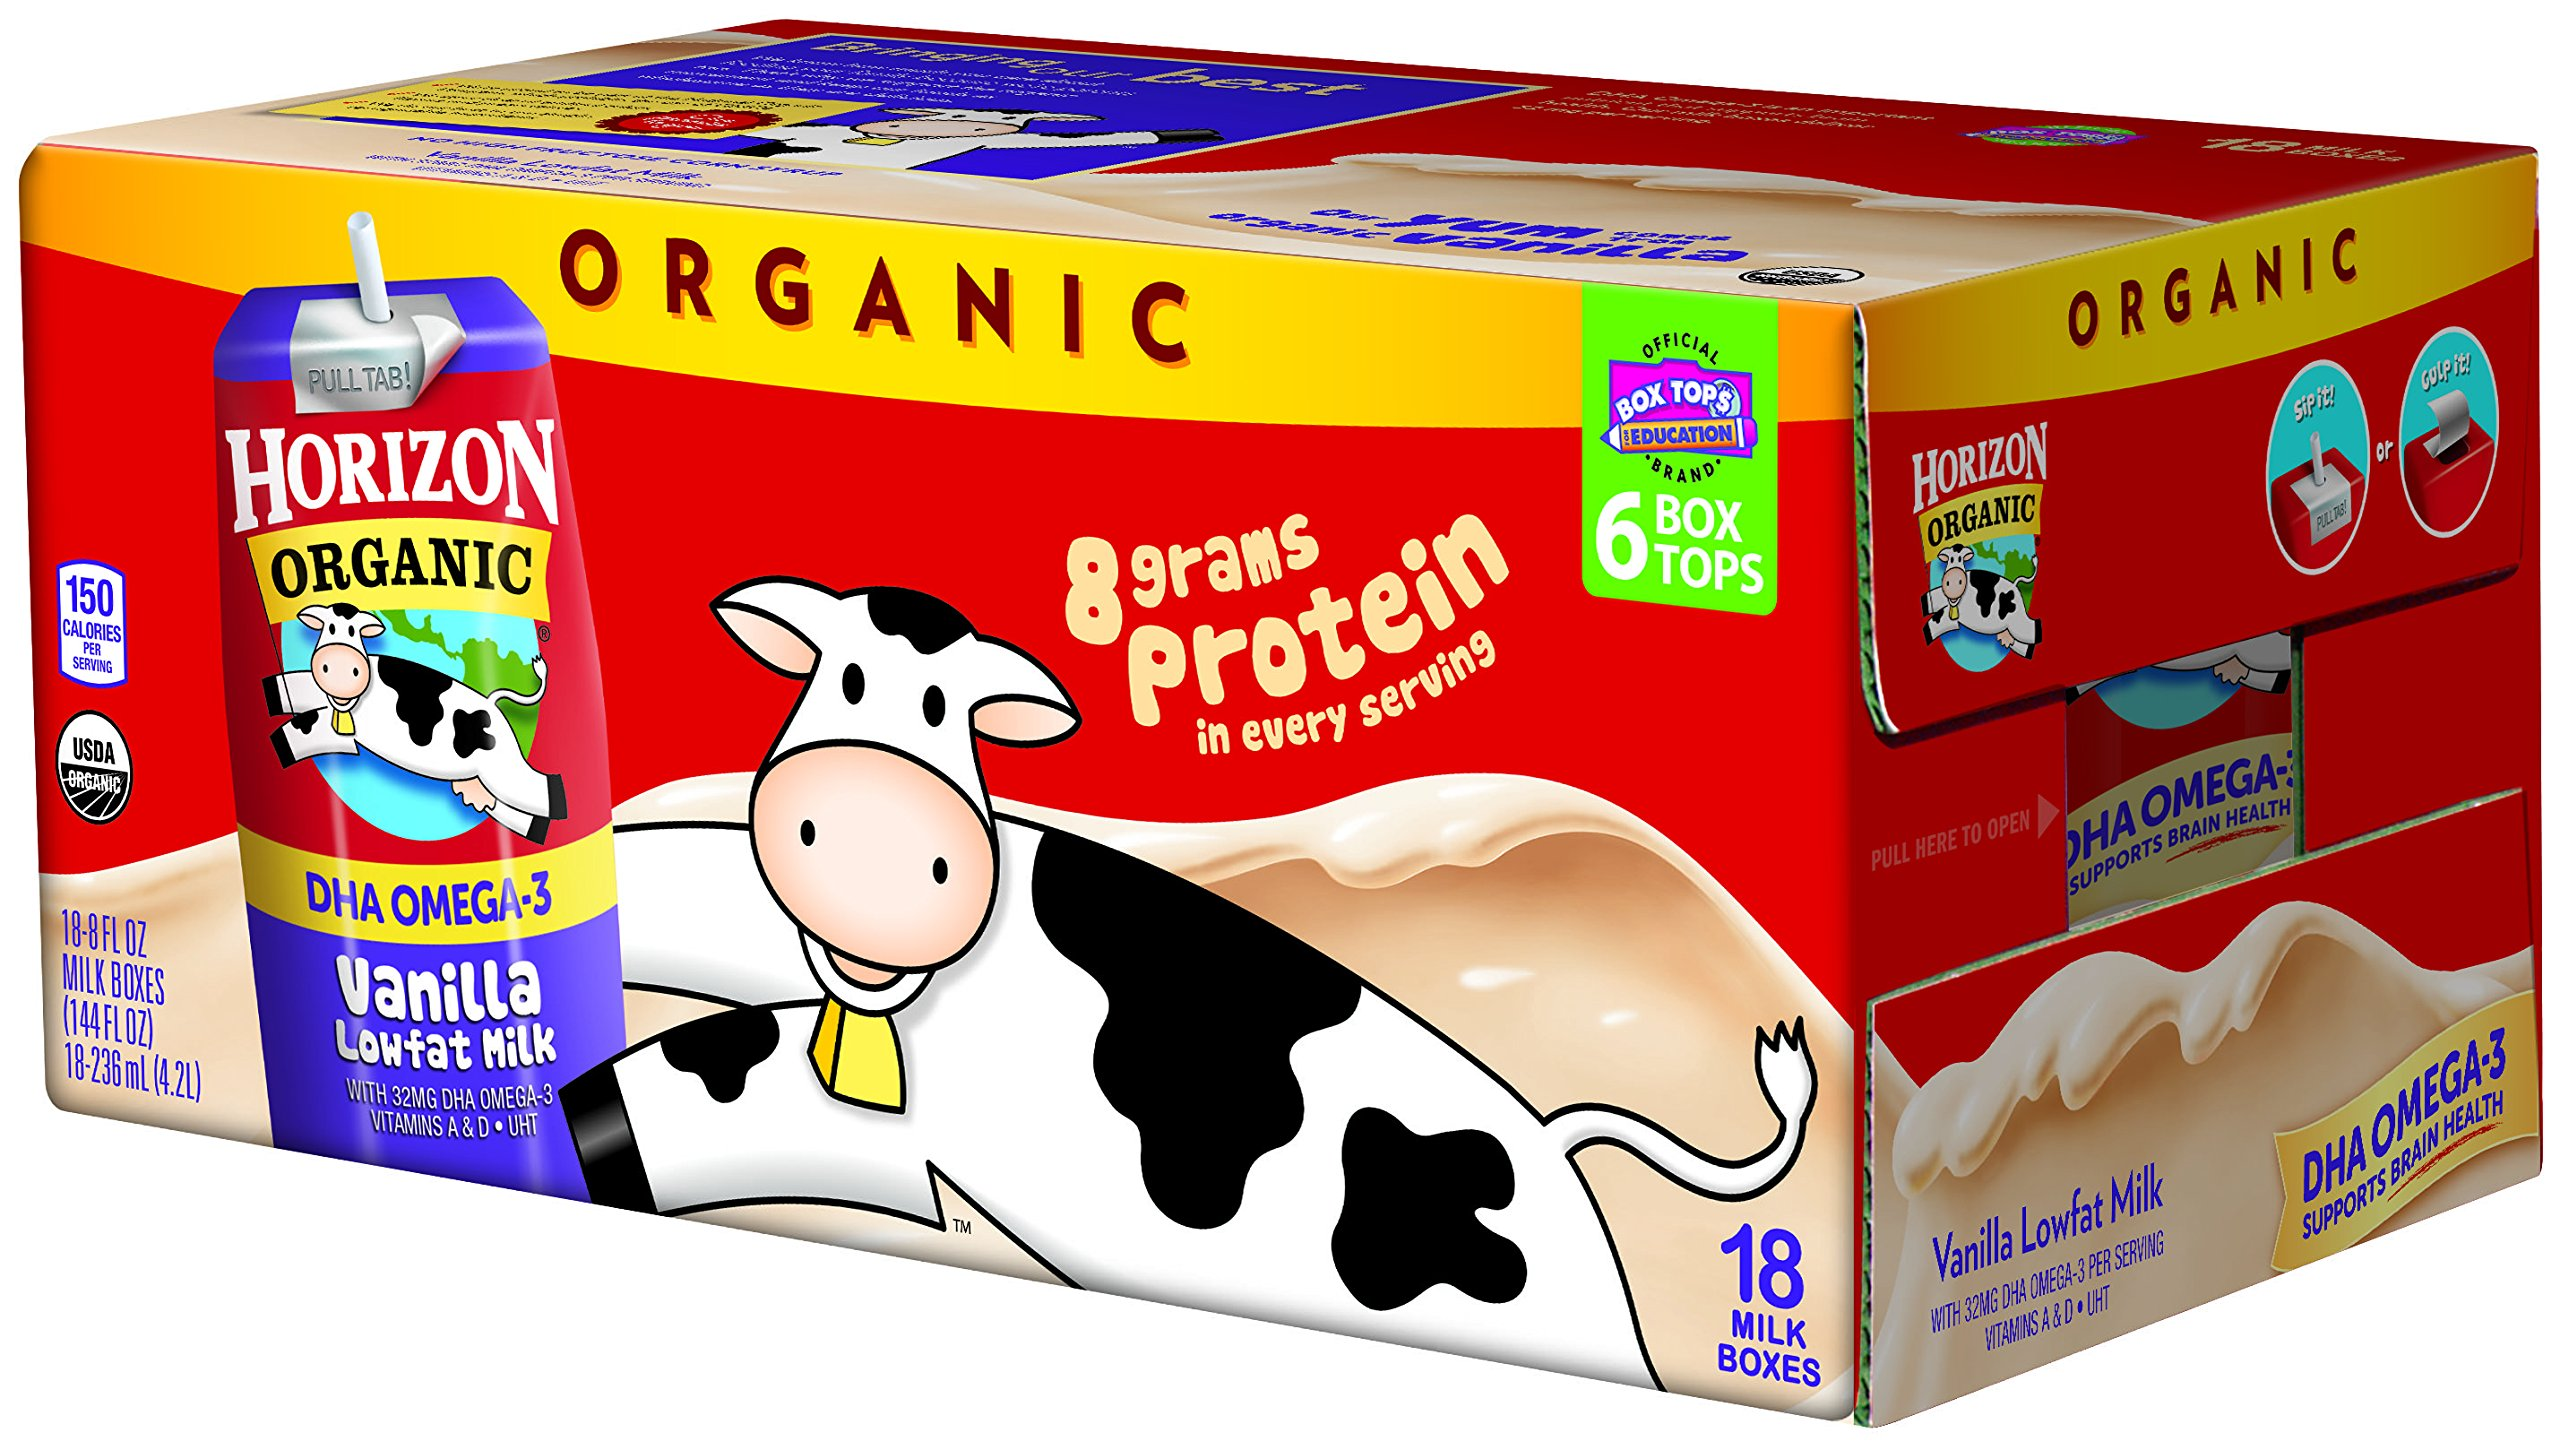 Horizon Organic Low Fat Organic Milk Box Plus DHA Omega-3, Vanilla, 8 Ounce (Pack of 18) by Horizon Organic